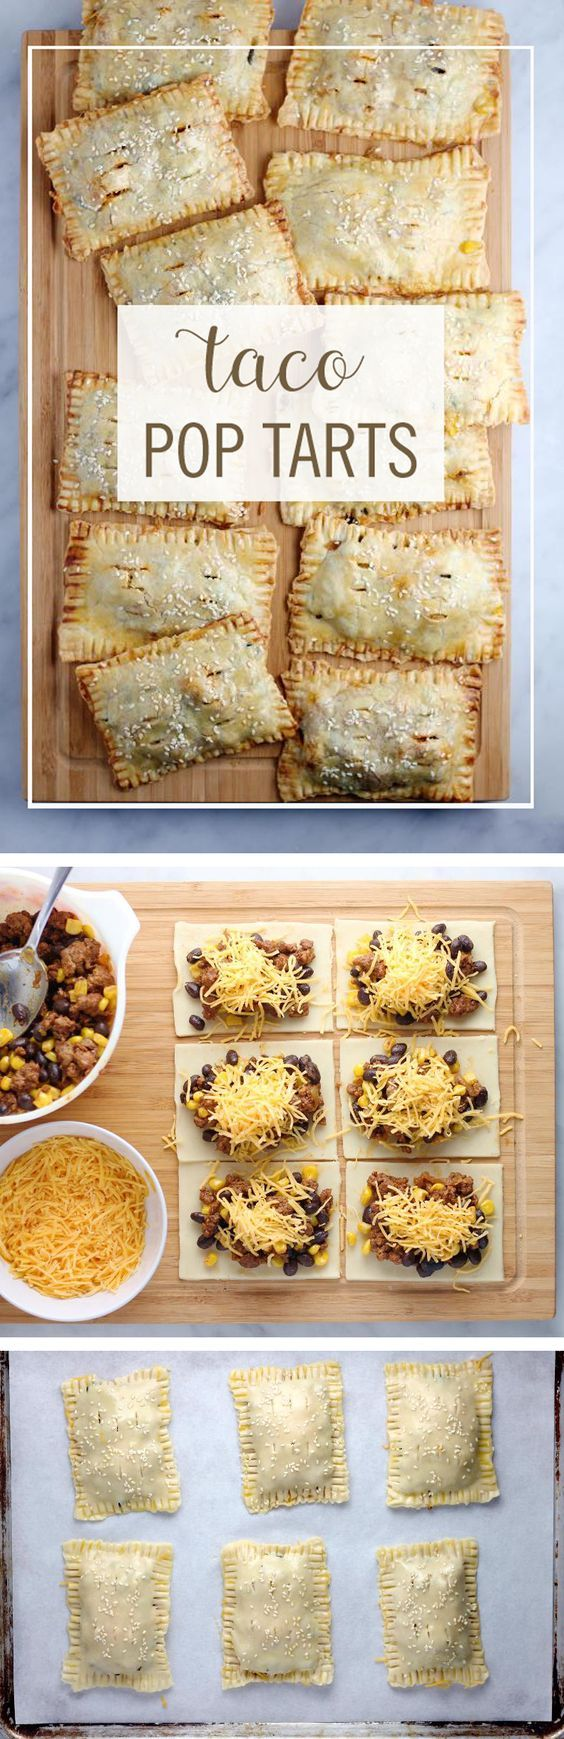 Taco Pop Tarts Recipe